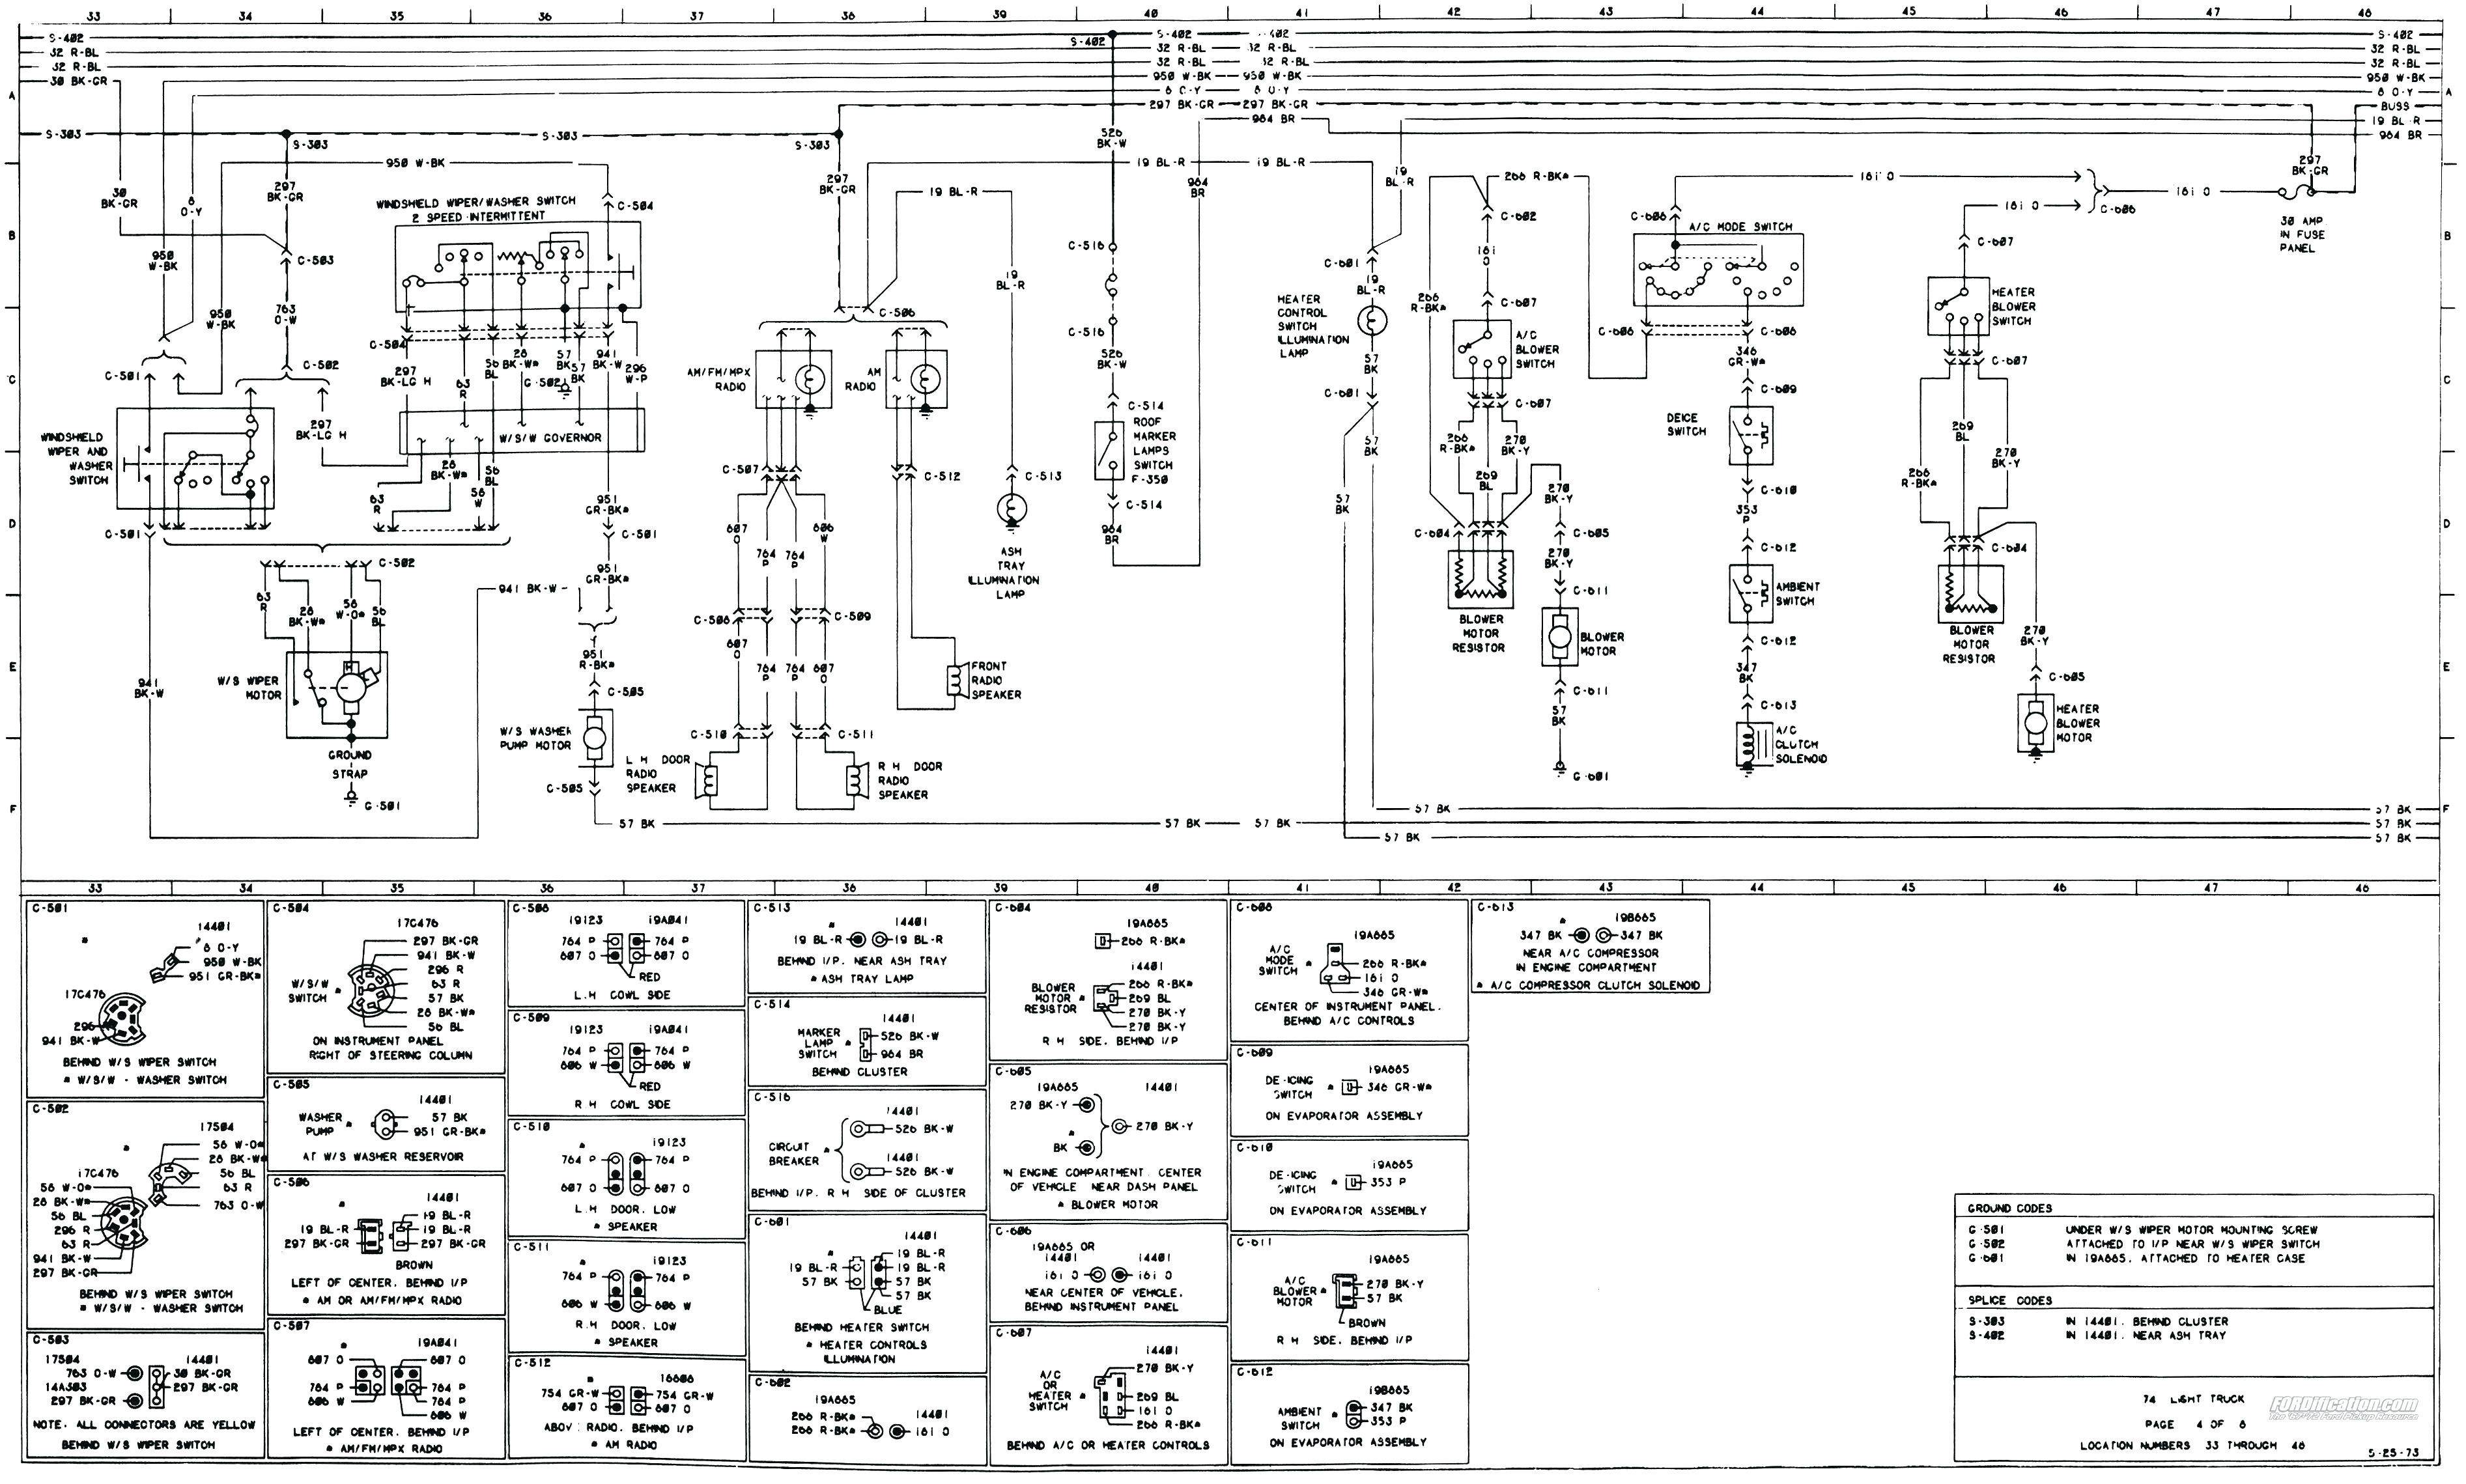 1996 jeep cherokee wiring diagram free - jeep grand cherokee ac wiring  diagram valid wiring diagram